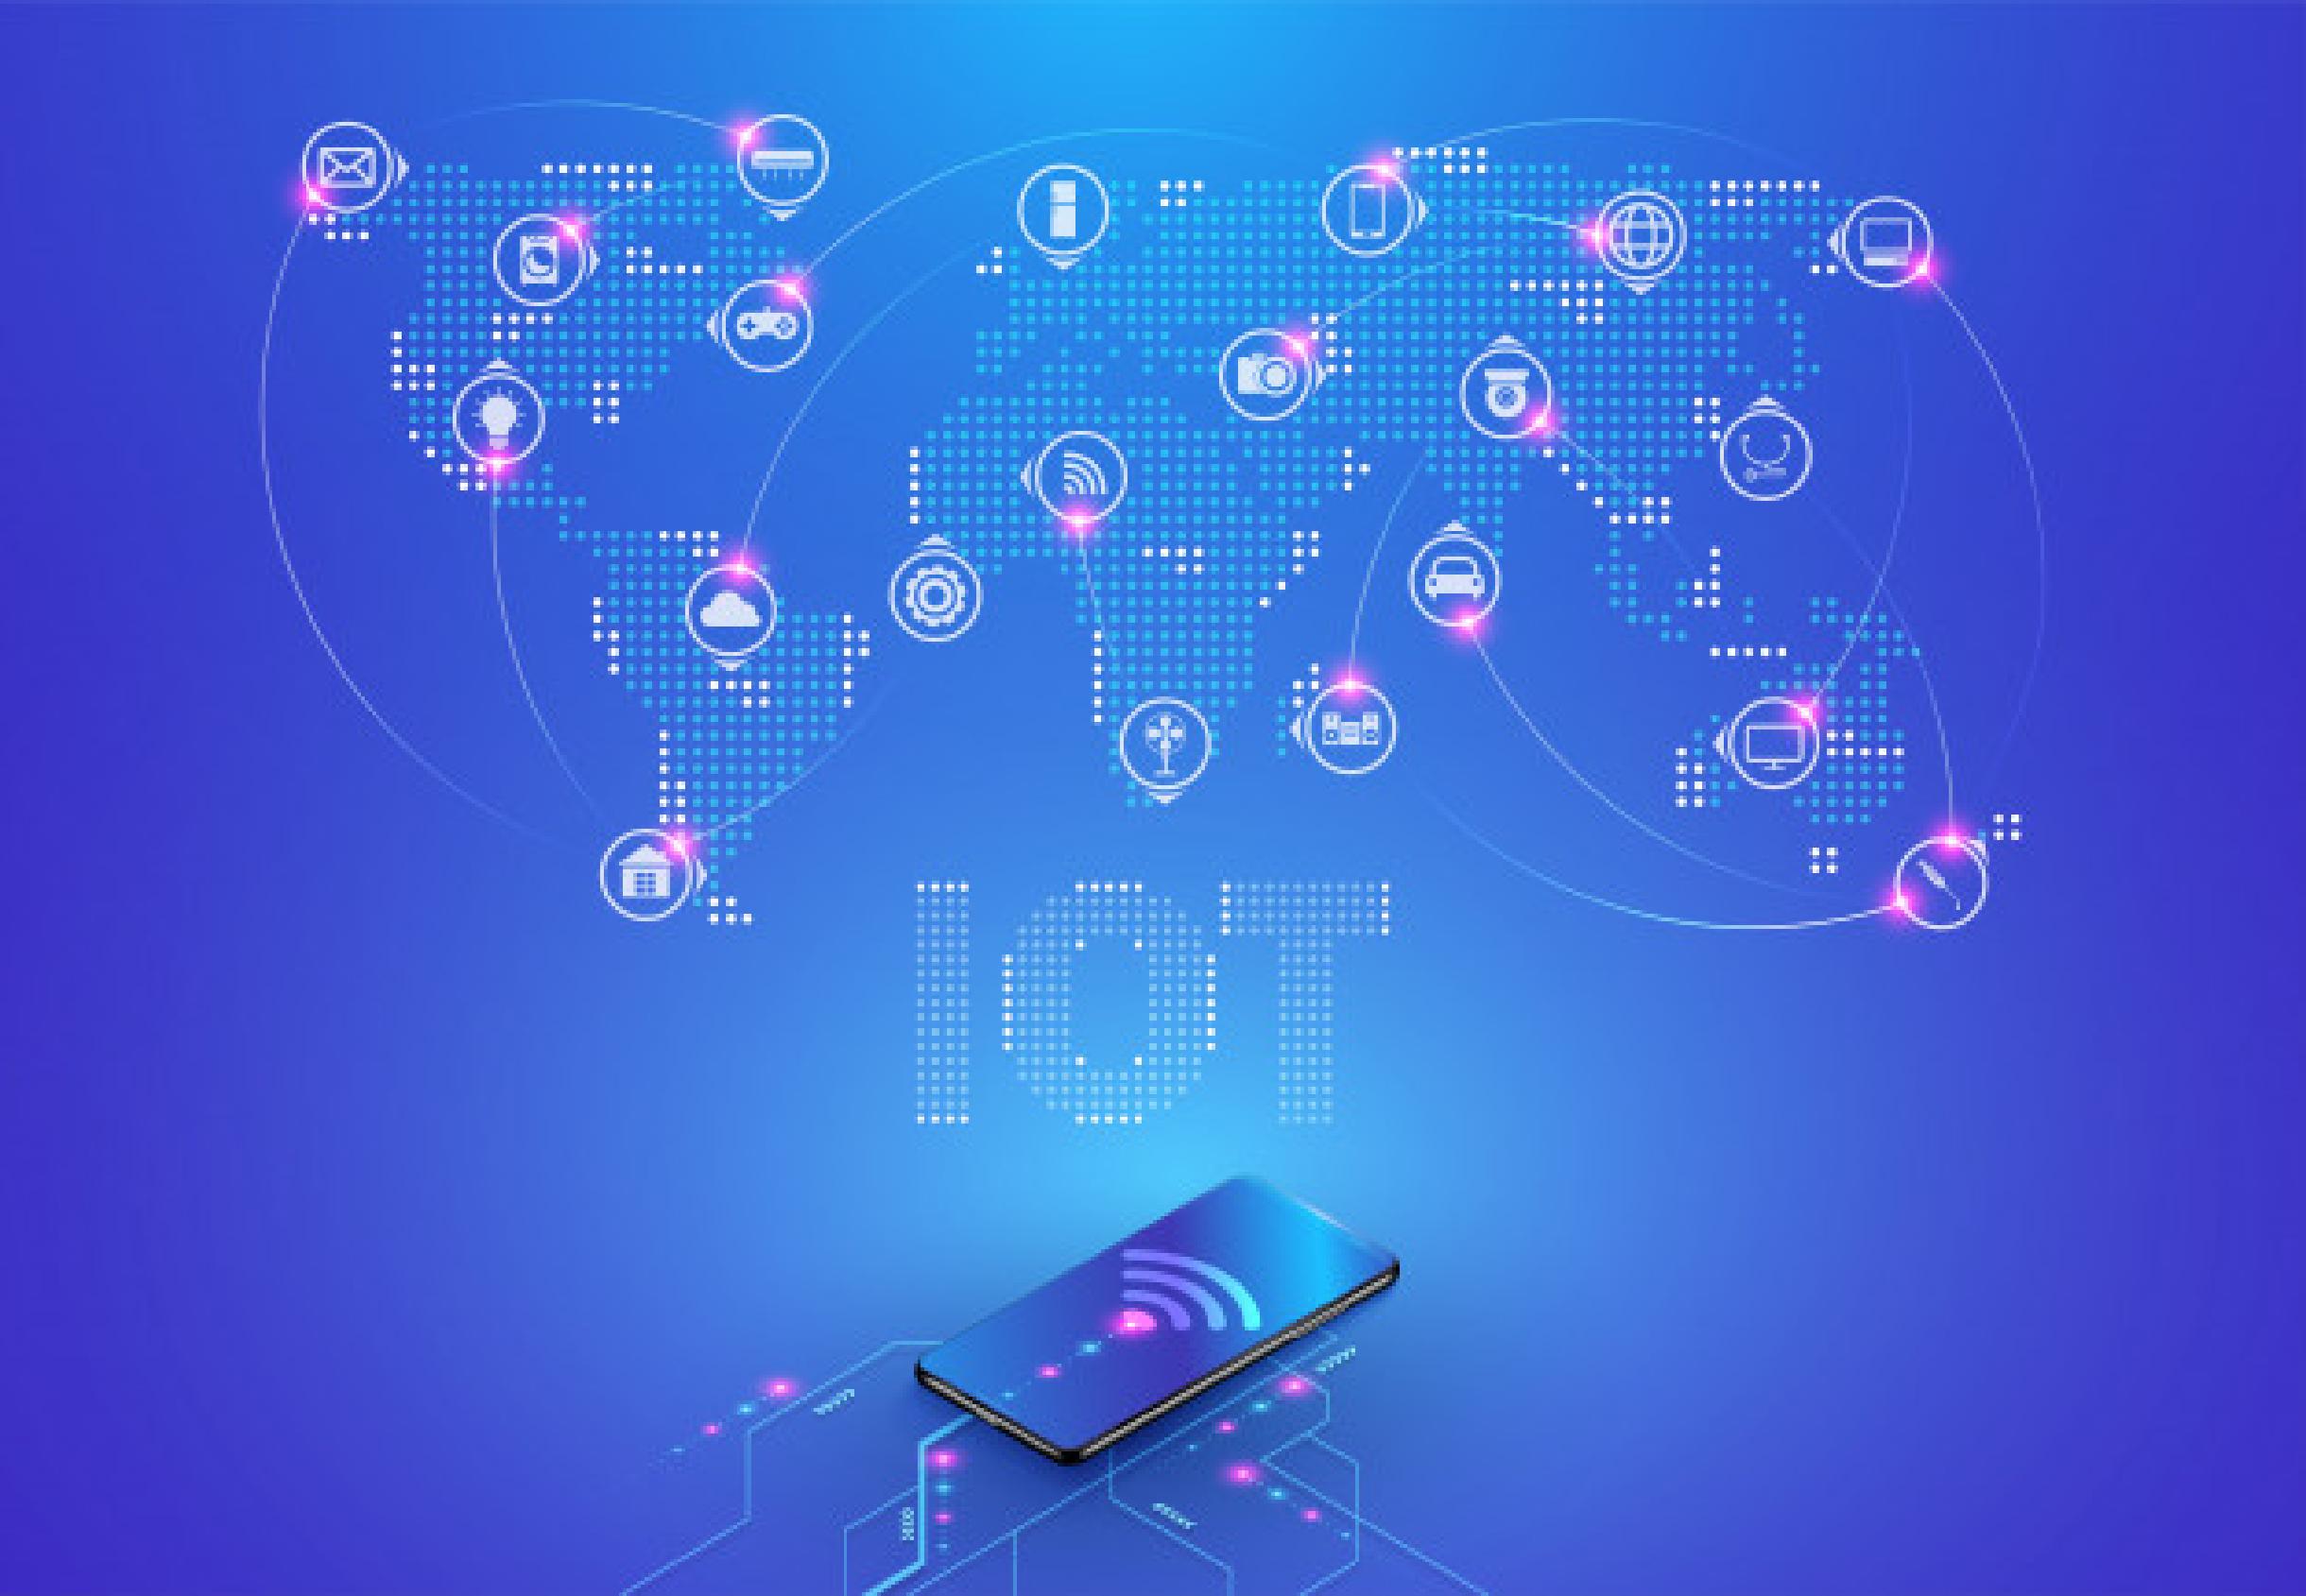 IoT Application Development Company in Bangalore, India